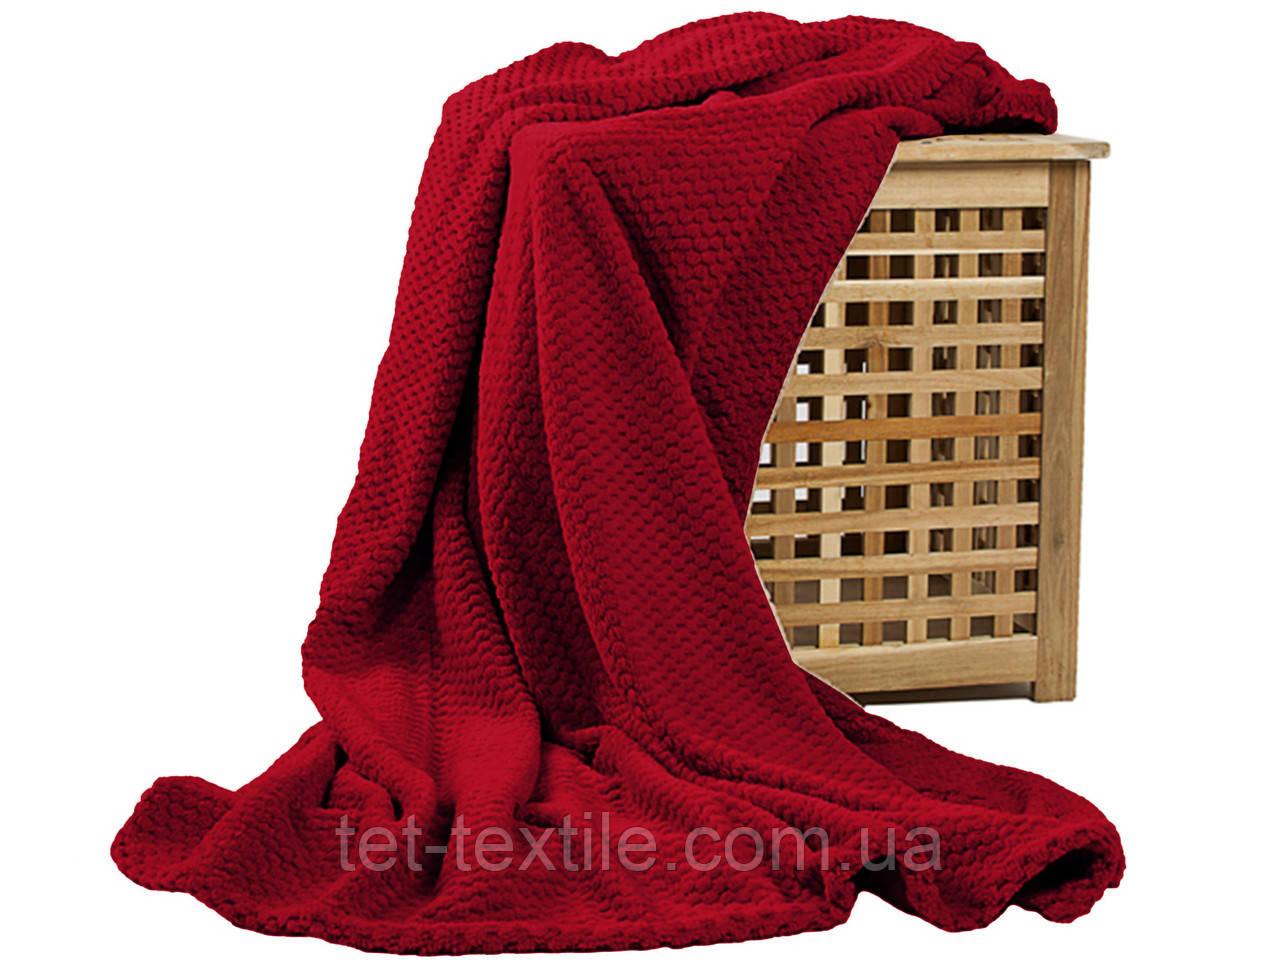 Плед из бамбукового волокна Koloco красный (200х230)